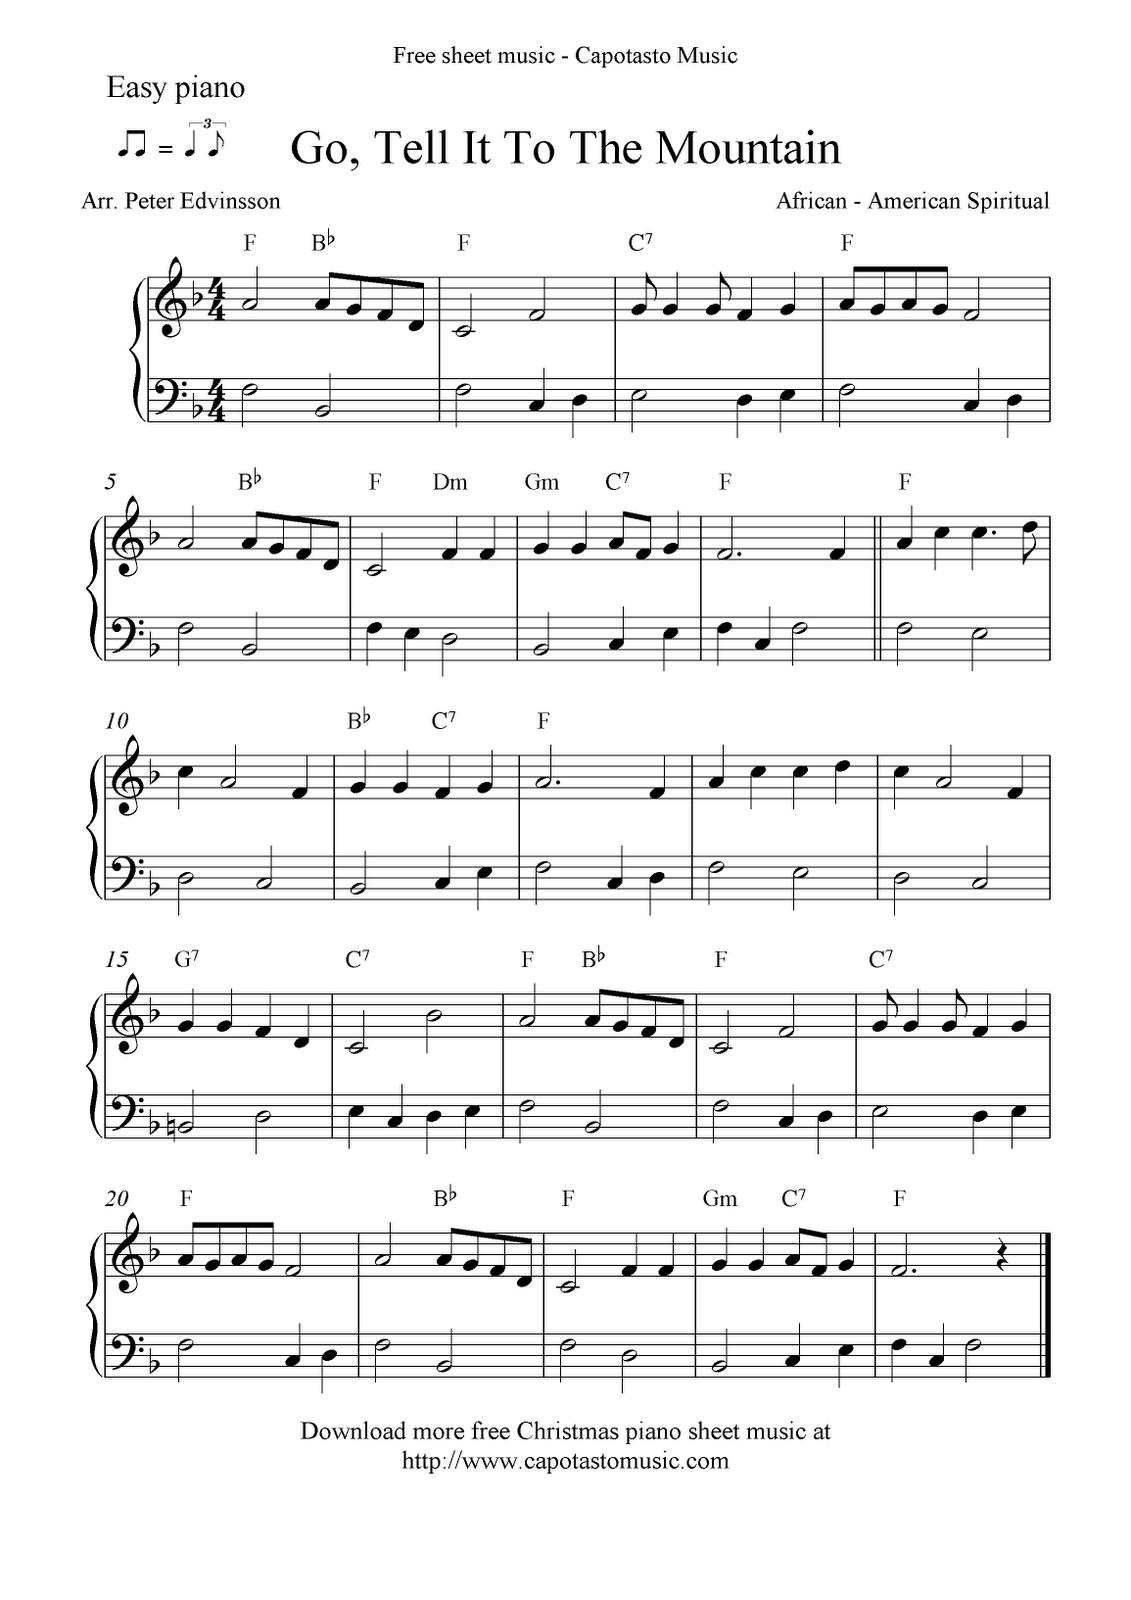 Free Printable Piano Sheet Music | Free Sheet Music Scores: Easy - Free Printable Christmas Sheet Music For Piano